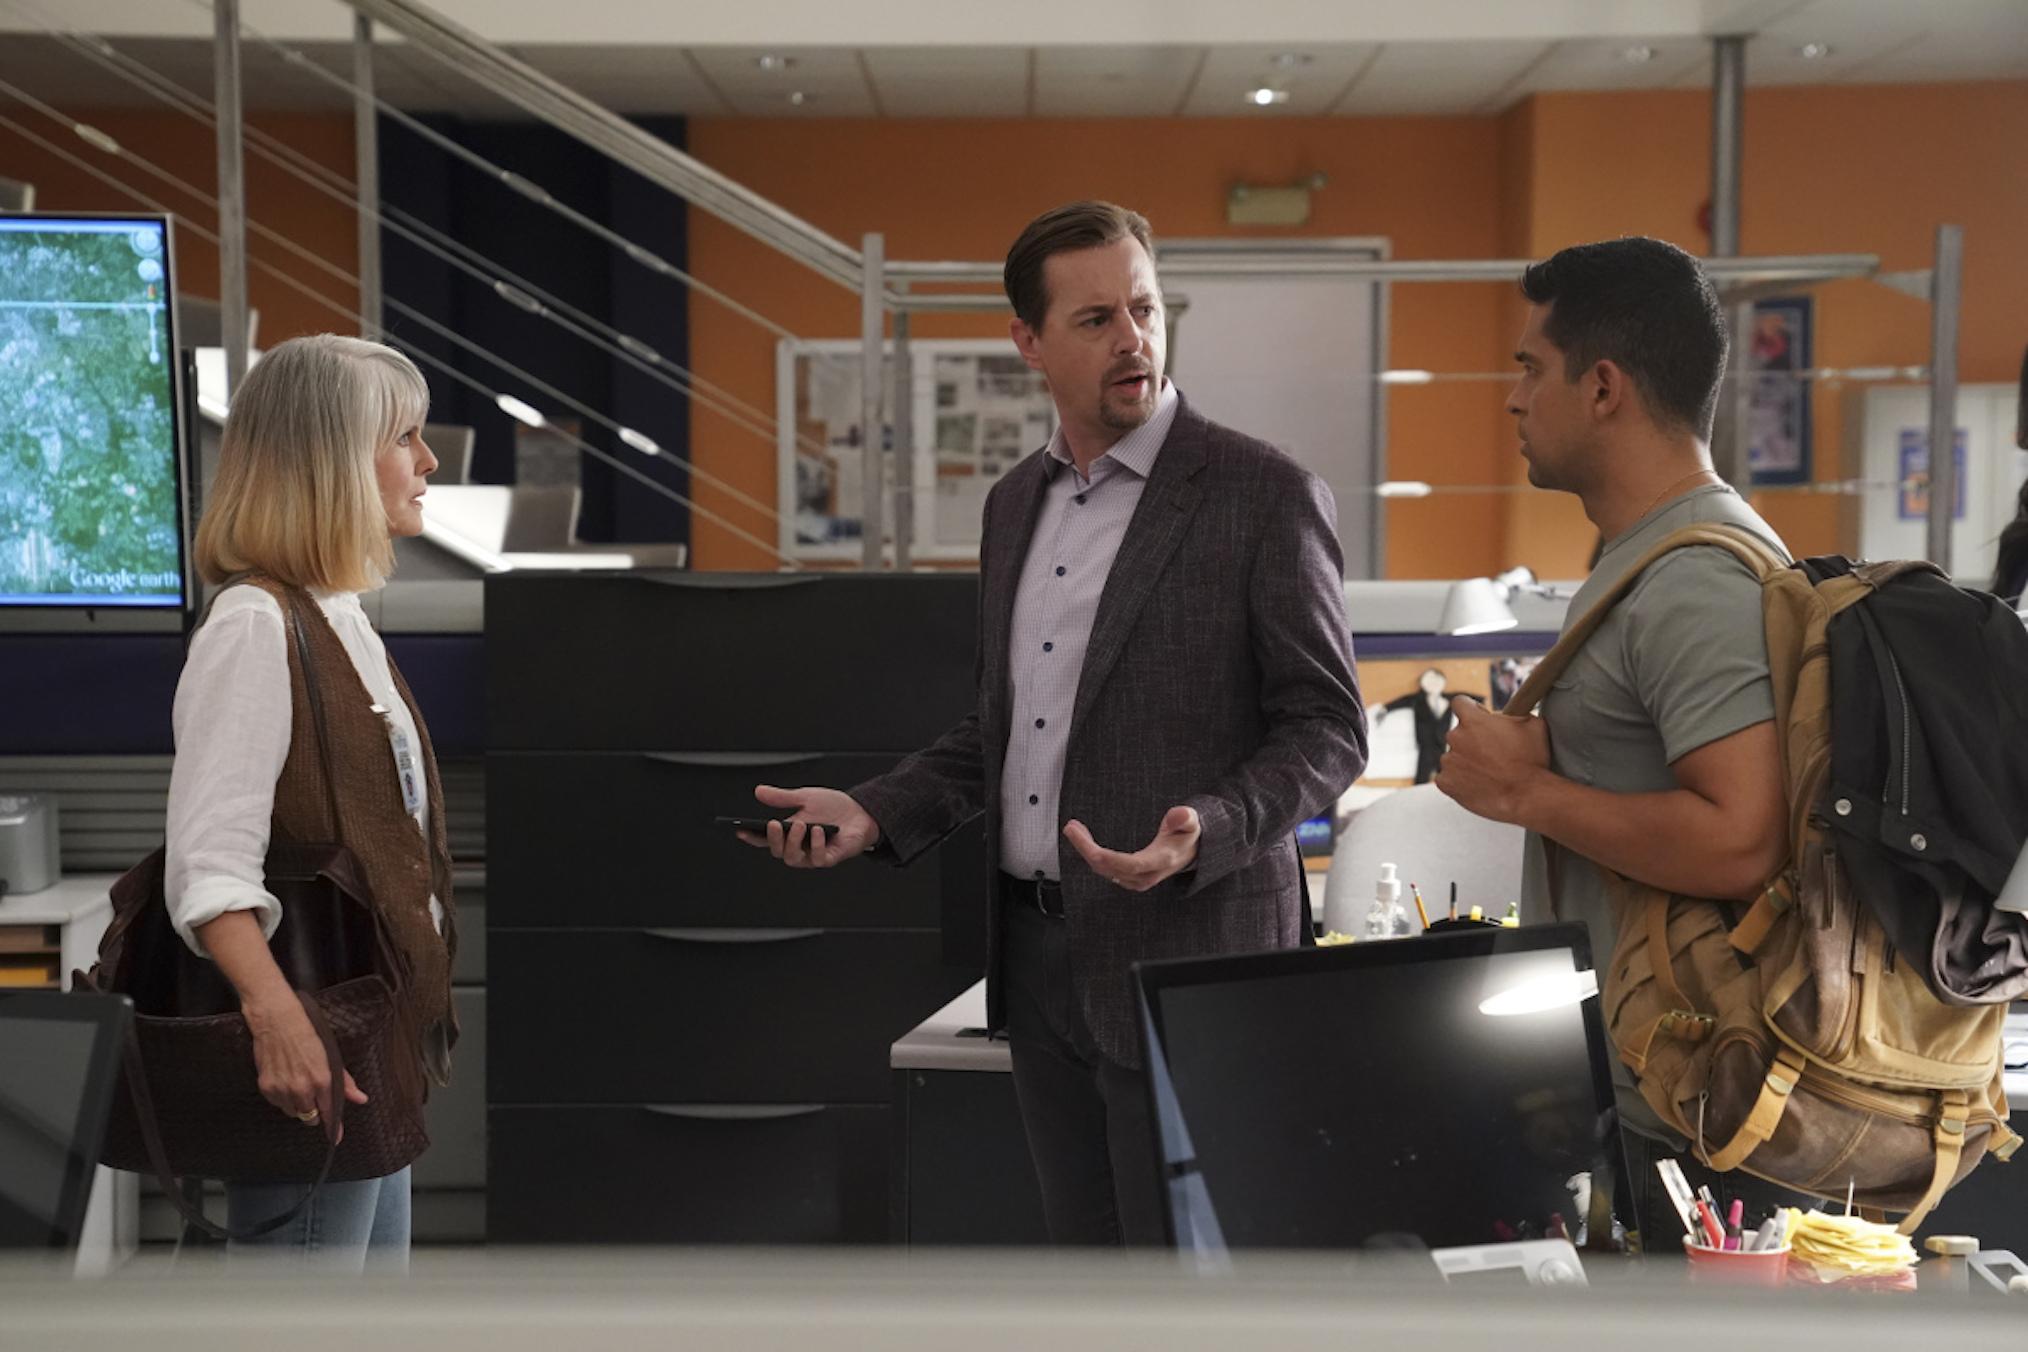 Pam Dawber as Marcie, Sean Murray as McGee, Wilmer Valderrama as Torres in NCIS